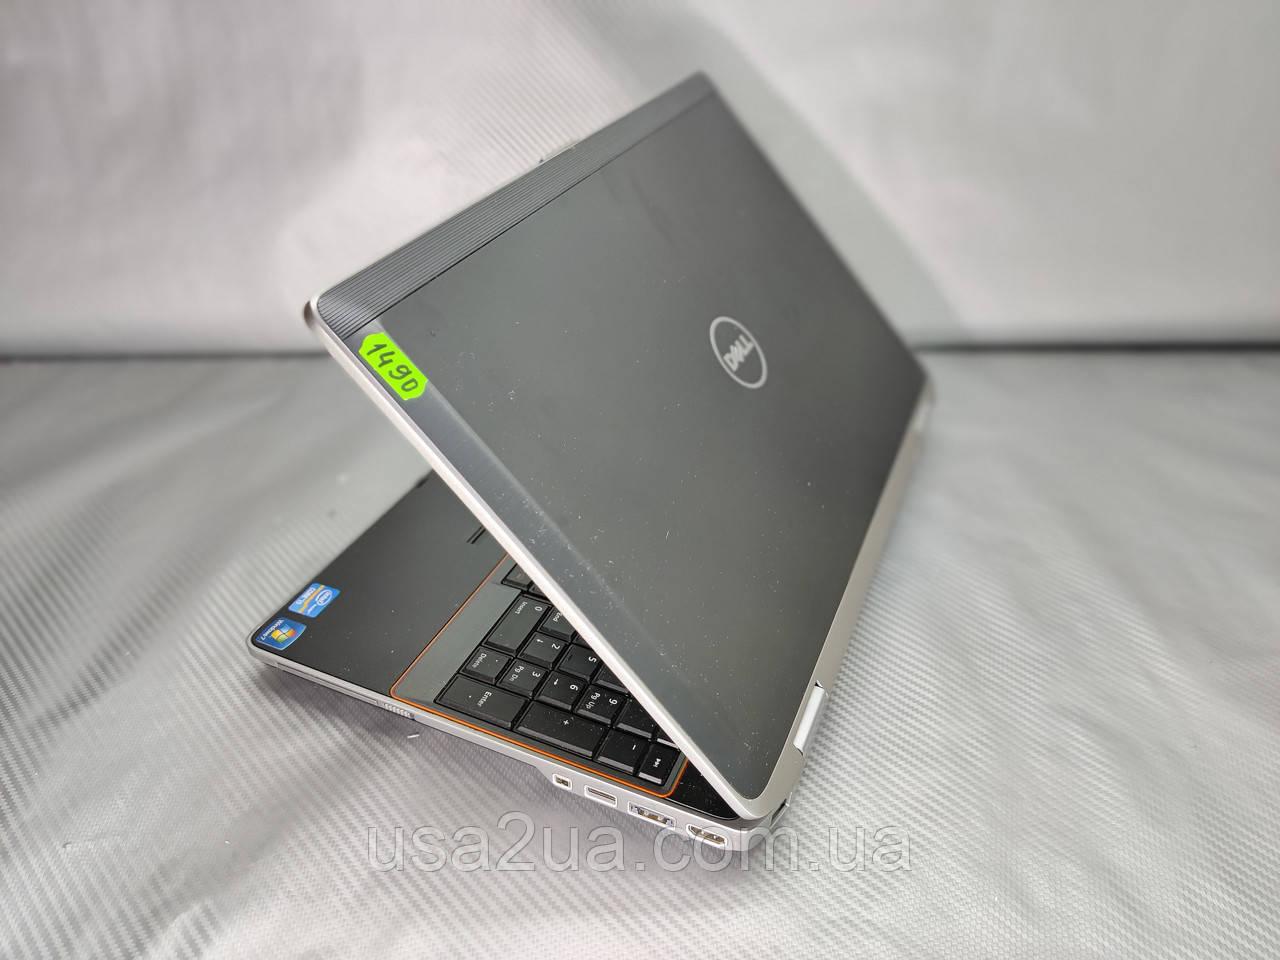 "Ноутбук Dell Latitude E6520 Core I5 2Gen 4Gb 500Gb 15.6"" Кредит Гарантія Доставка"